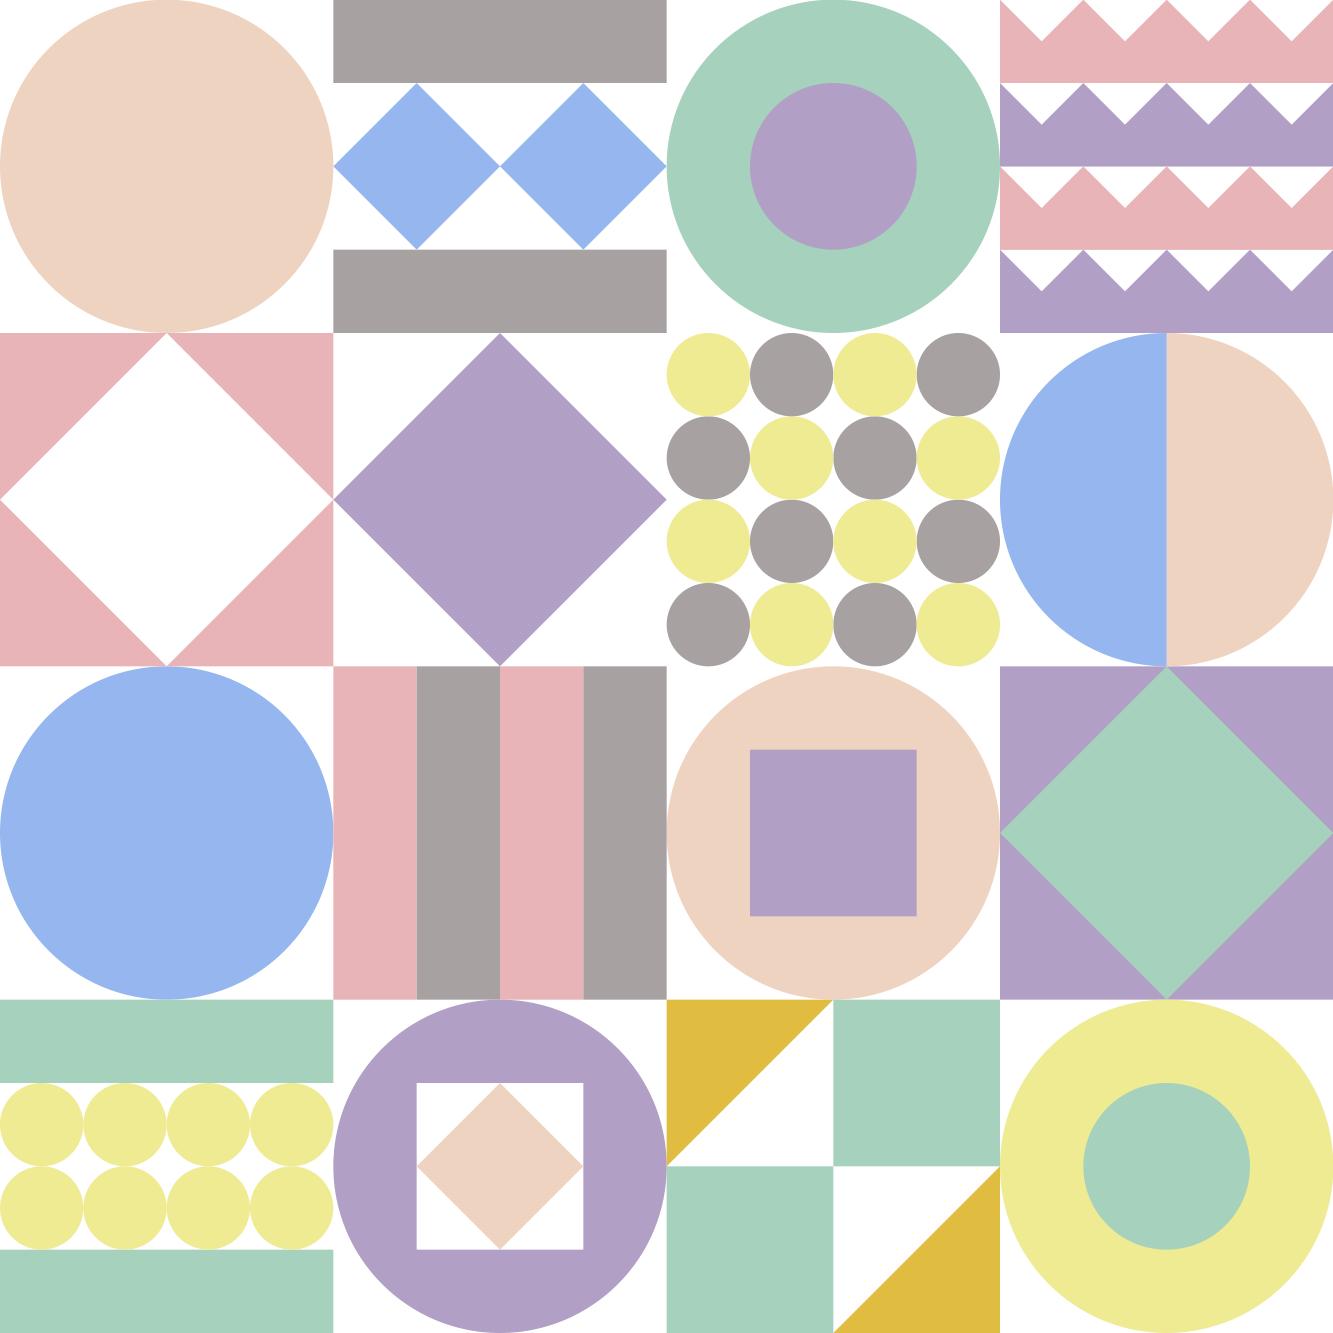 Patterns_Pastels_RGB.png